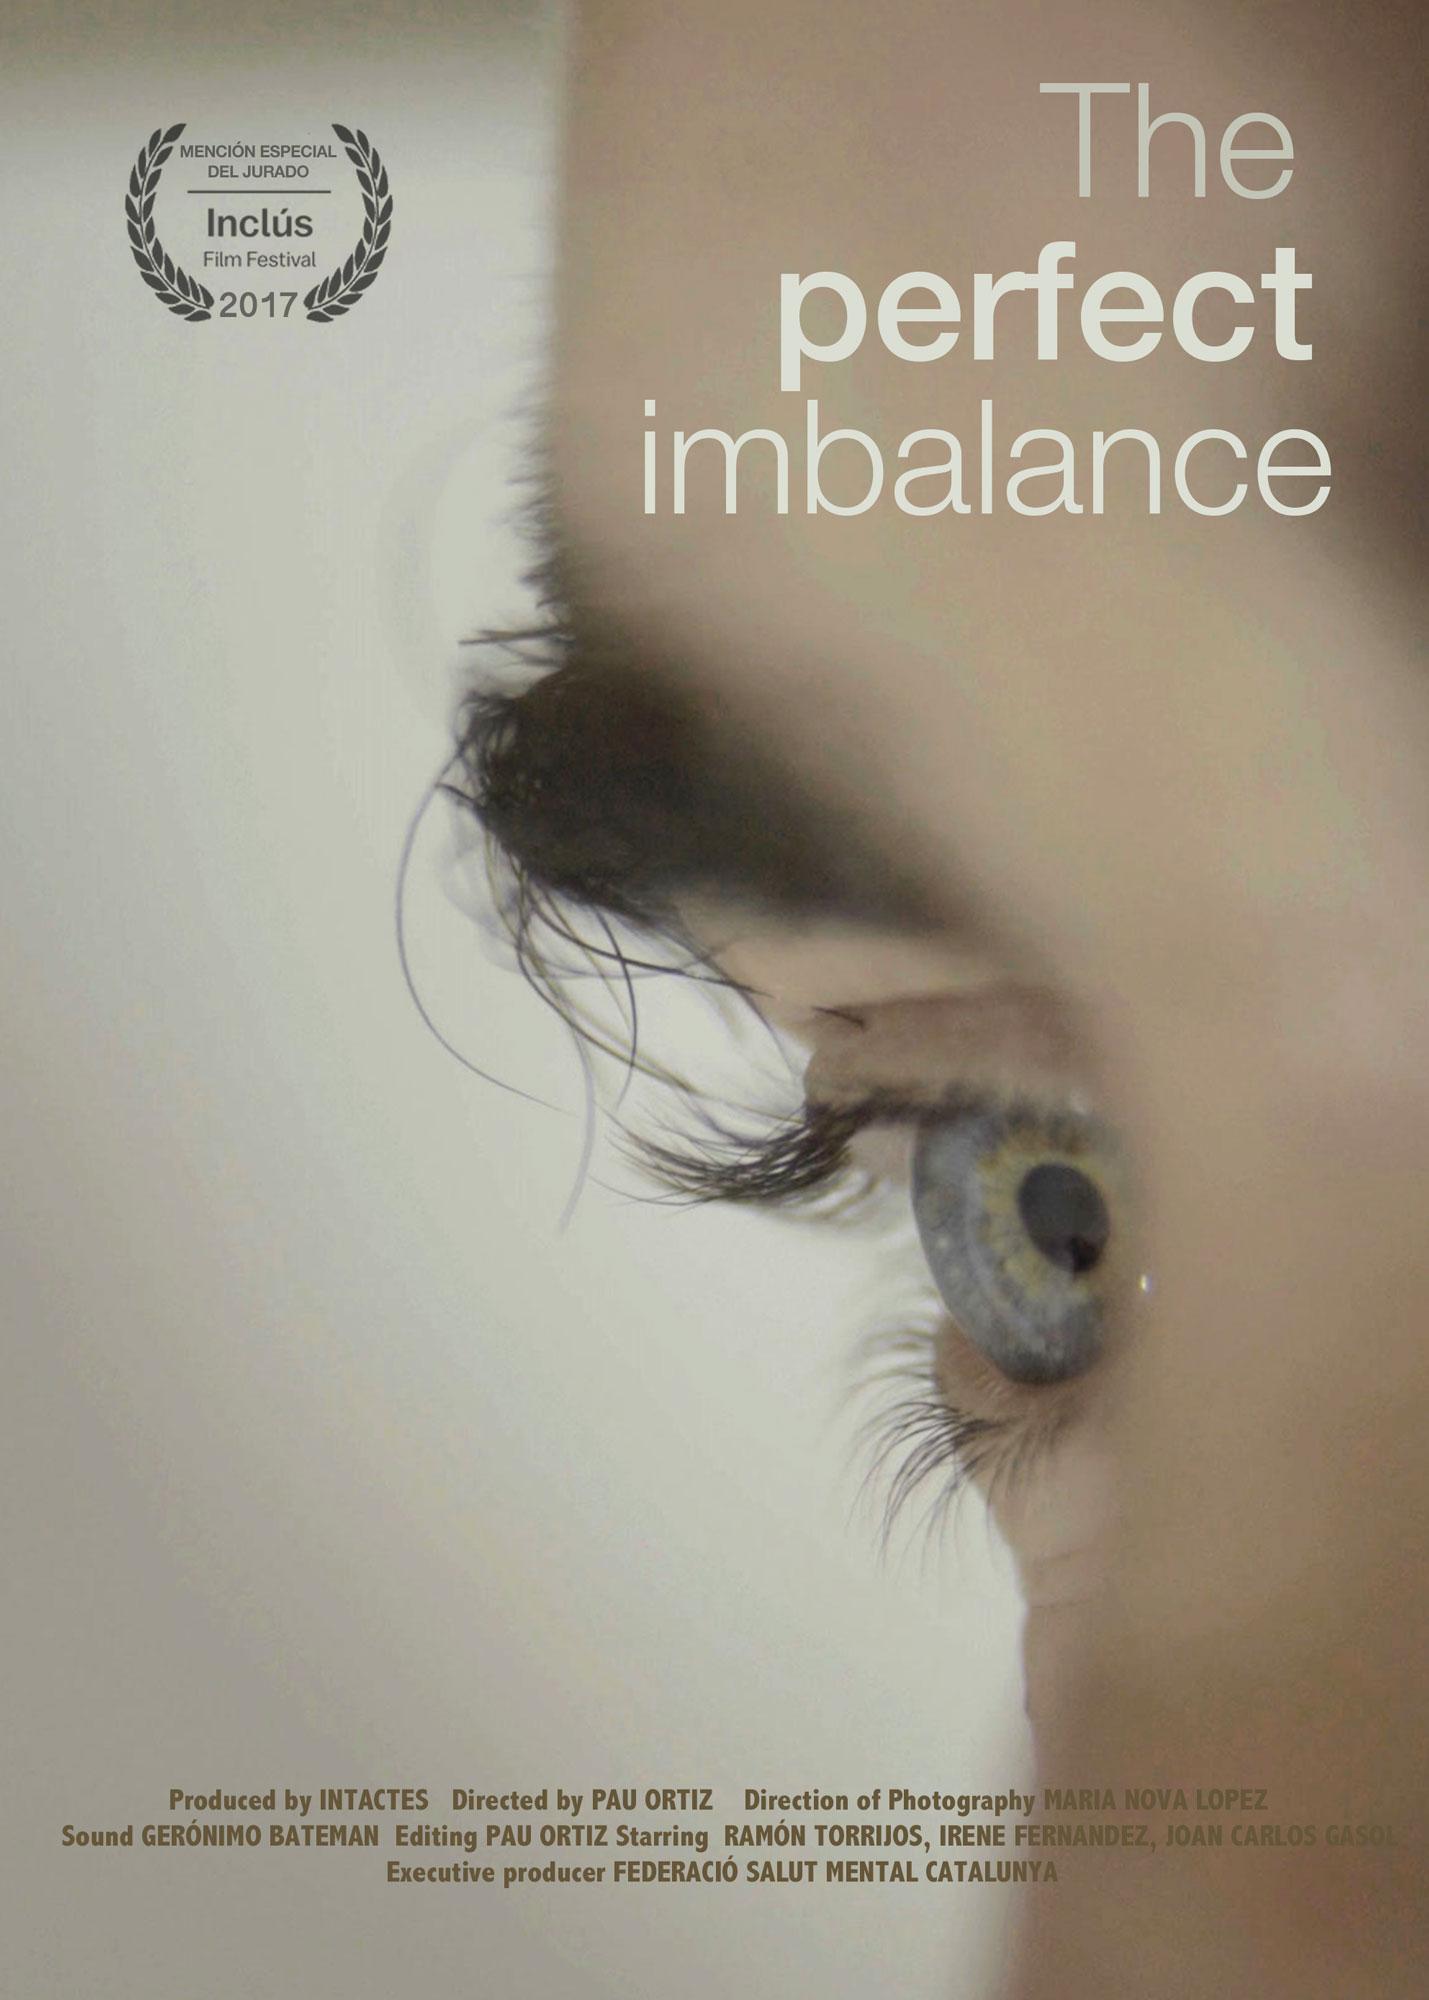 SHORT DOCUMENTARY (17') THE PERFECT IMBALANCE